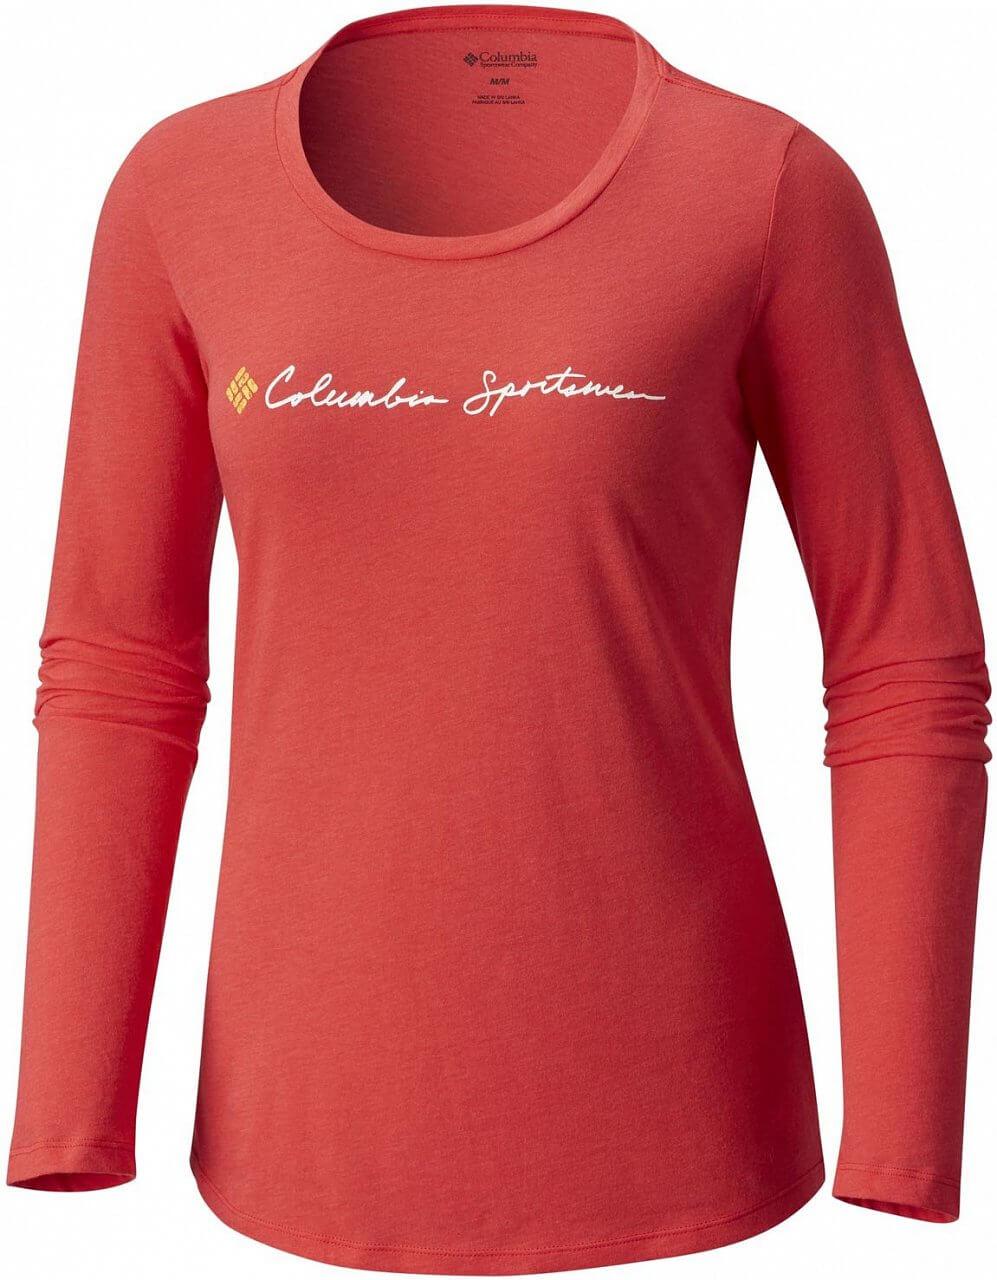 Dámské tričko Columbia CSC Script Logo LS Tee